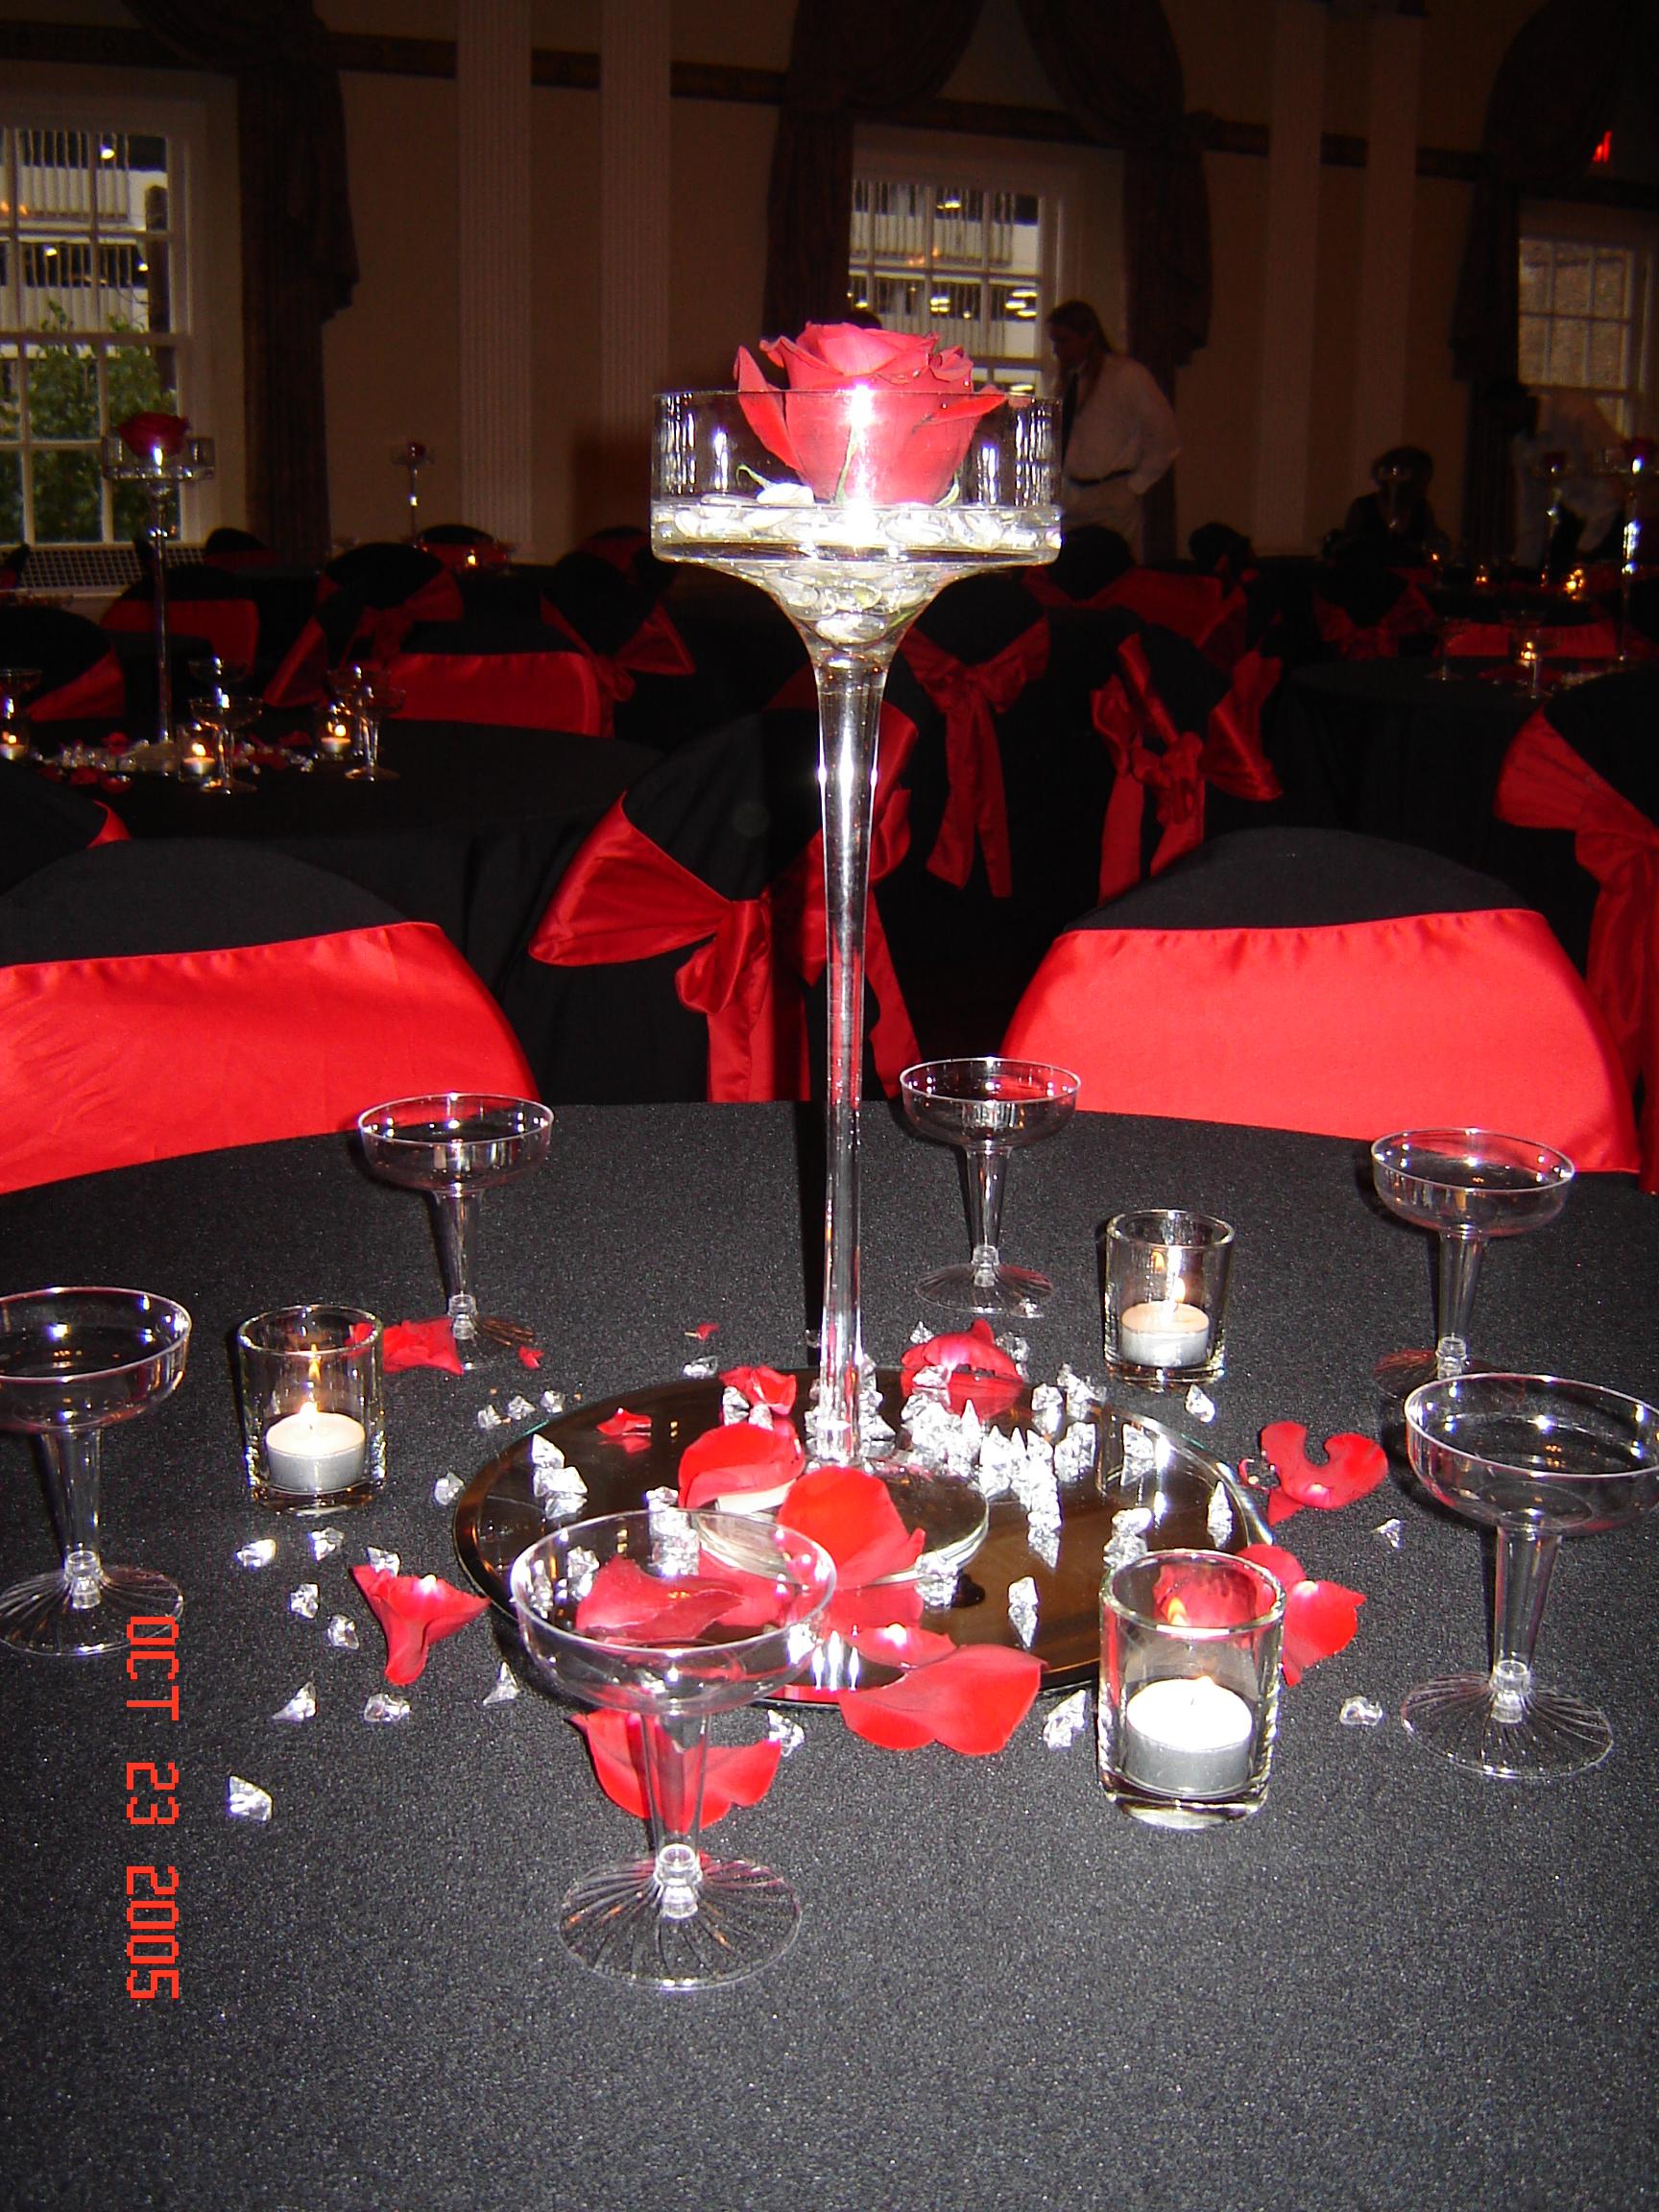 Centerpieces table centerpieces maestro vase centerpiece centerpieces table centerpieces maestro vase centerpiece wedding centerpiecs trumpet vases hurricane globes candelabras votive candles reviewsmspy